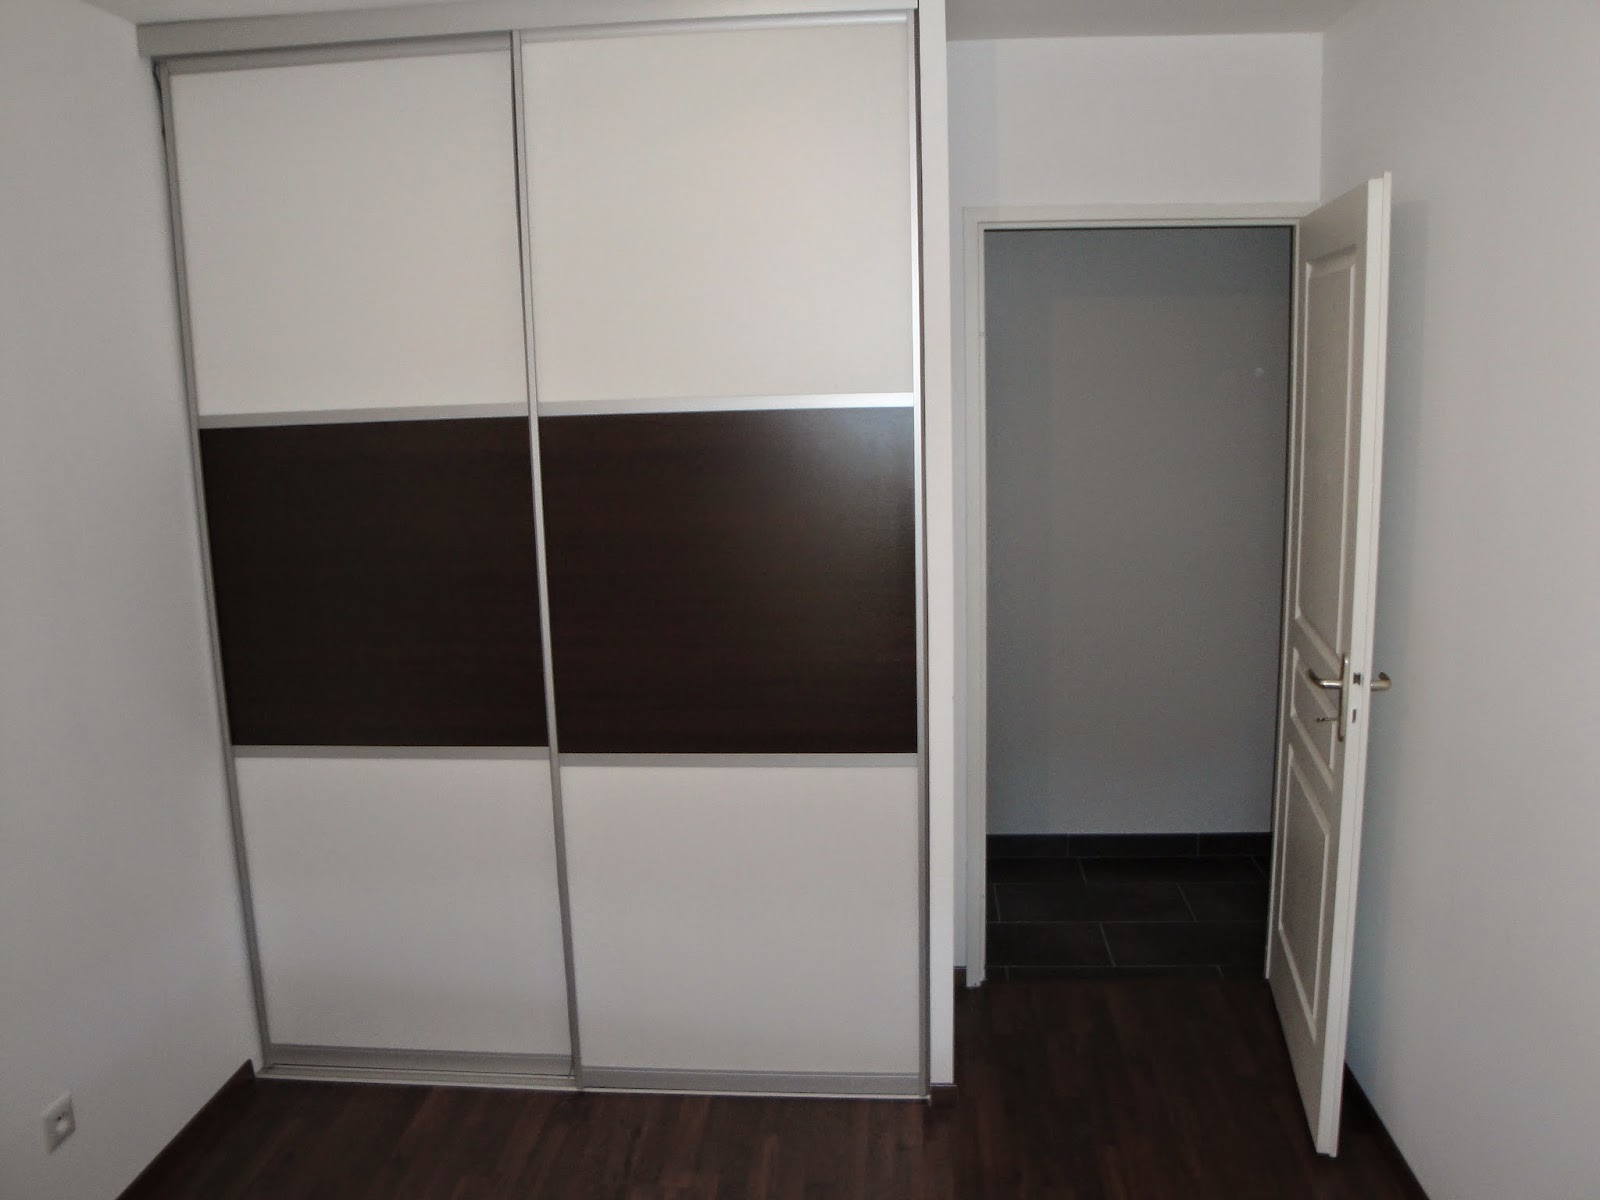 votre cuisine mobalpa par virginie fa ades sur mesure mobalpa. Black Bedroom Furniture Sets. Home Design Ideas